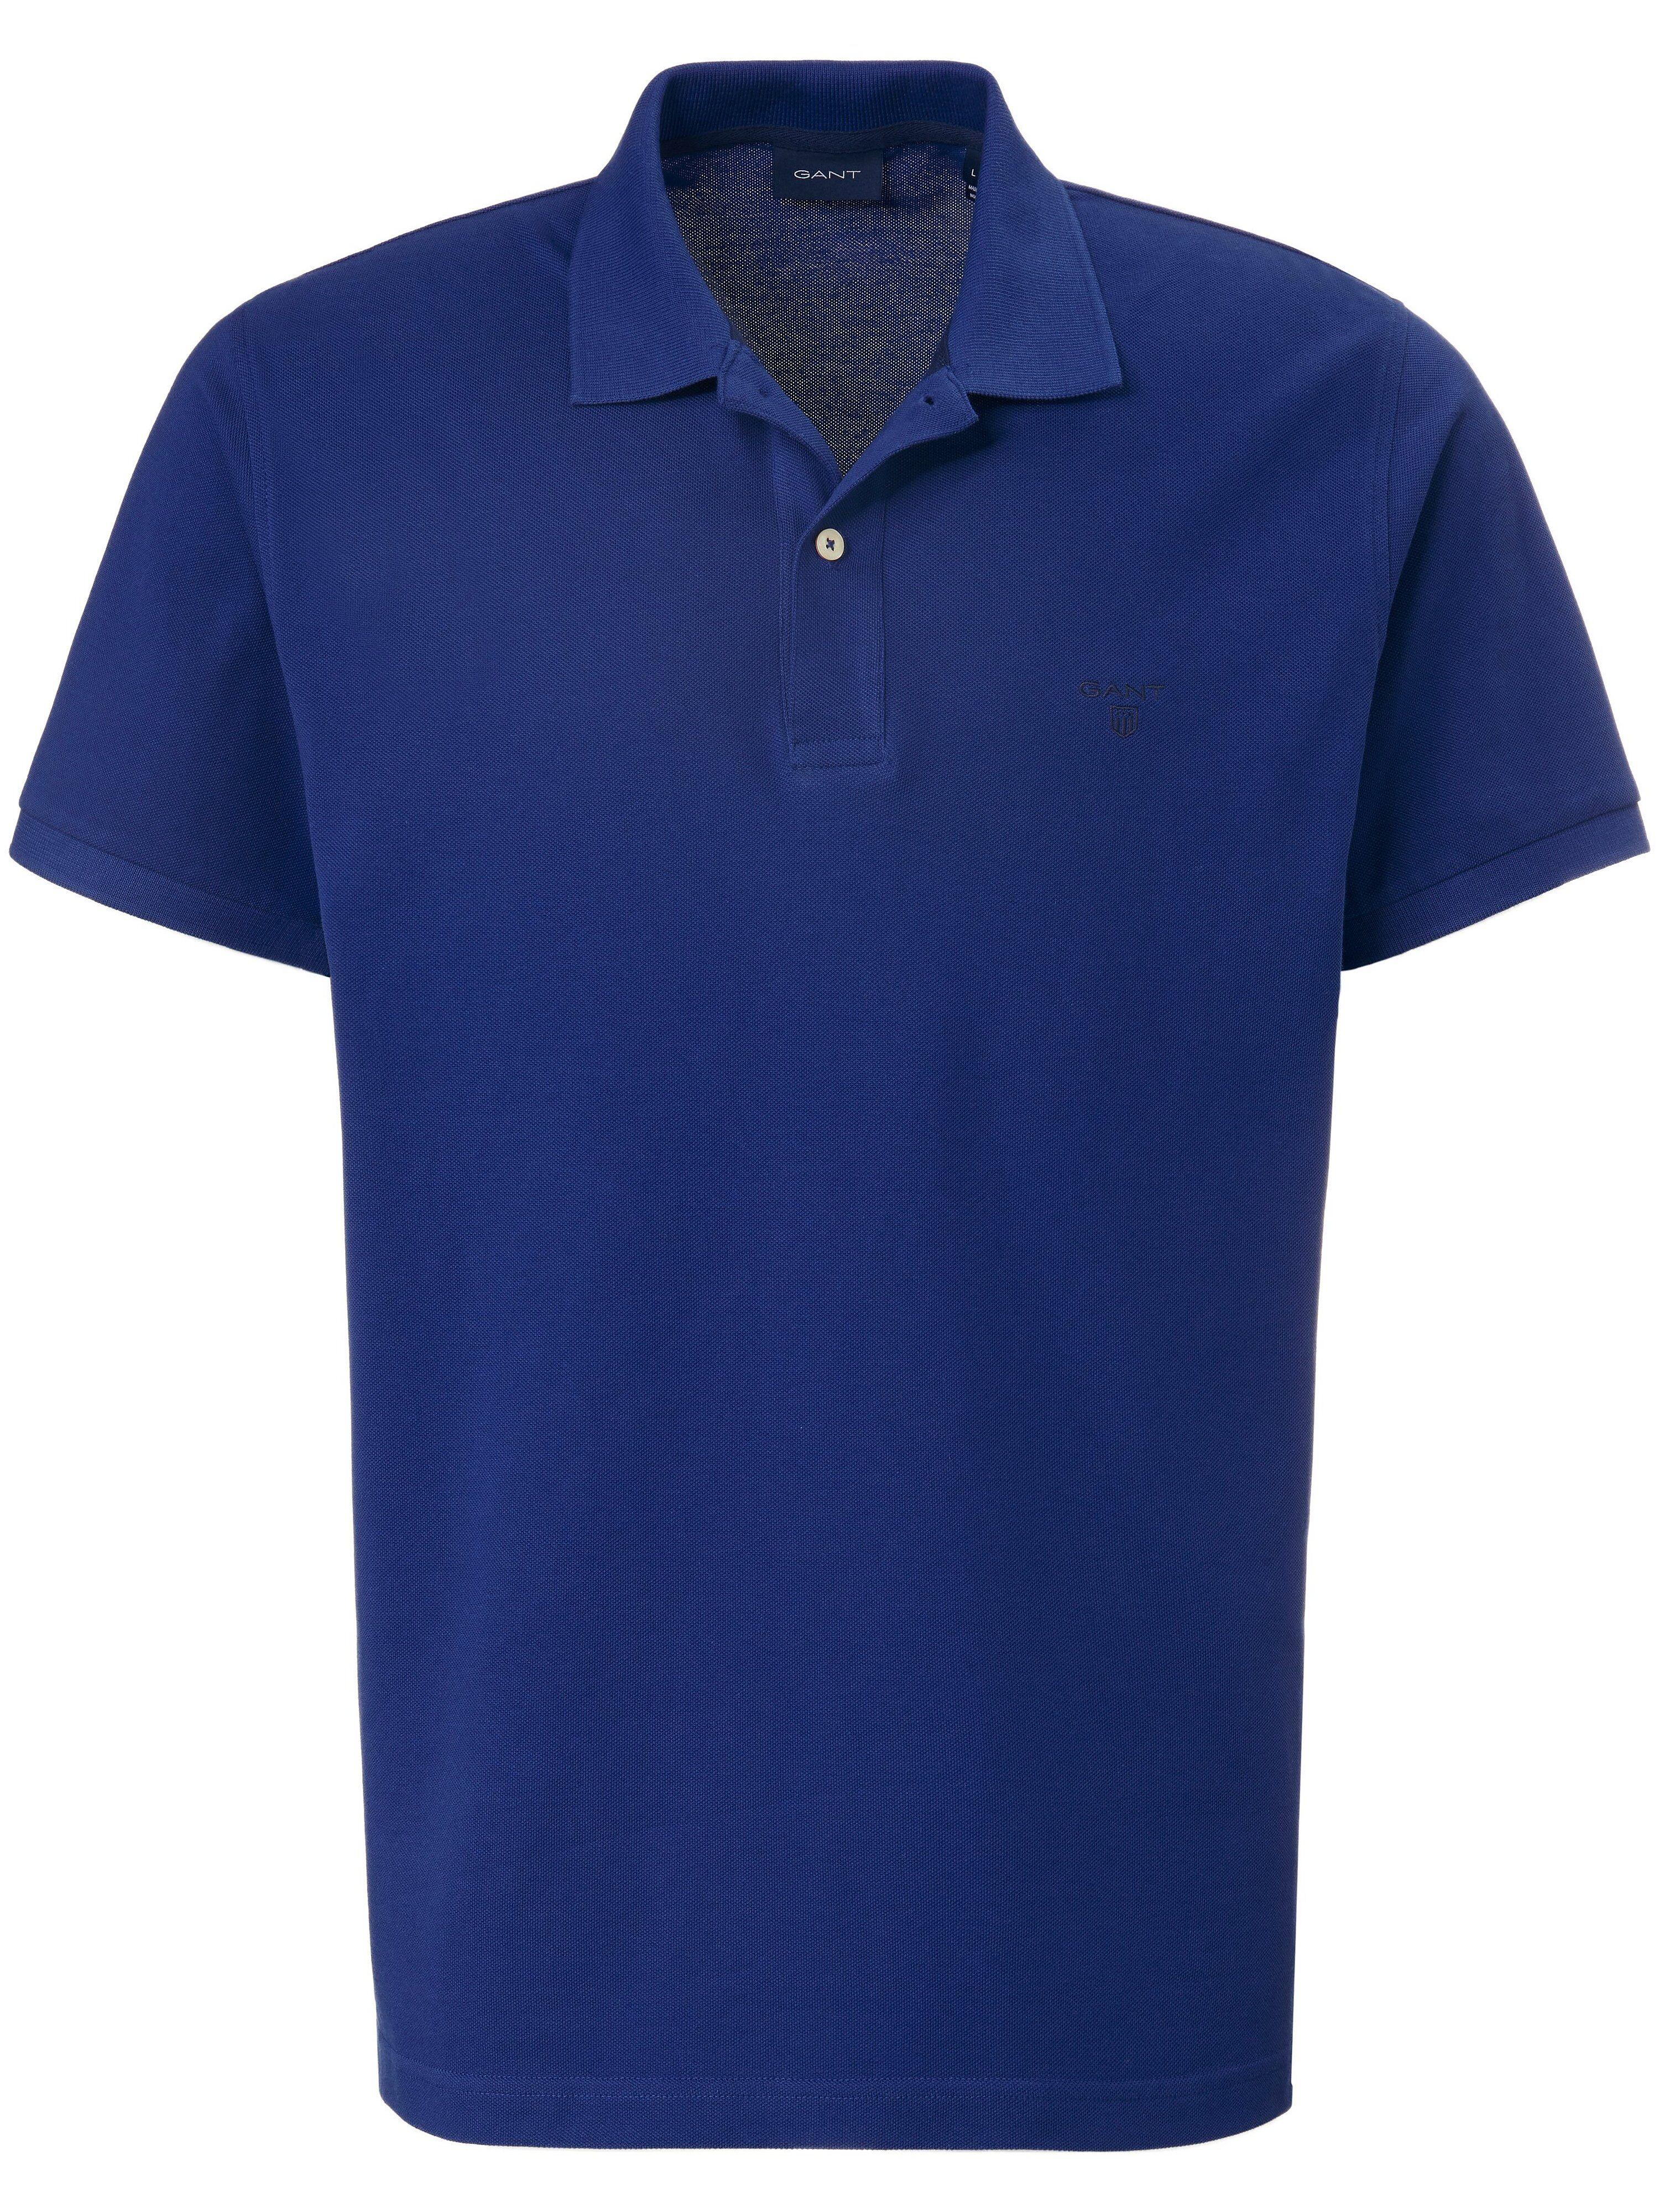 Gant La chemise   GANT bleu  - Homme - 52